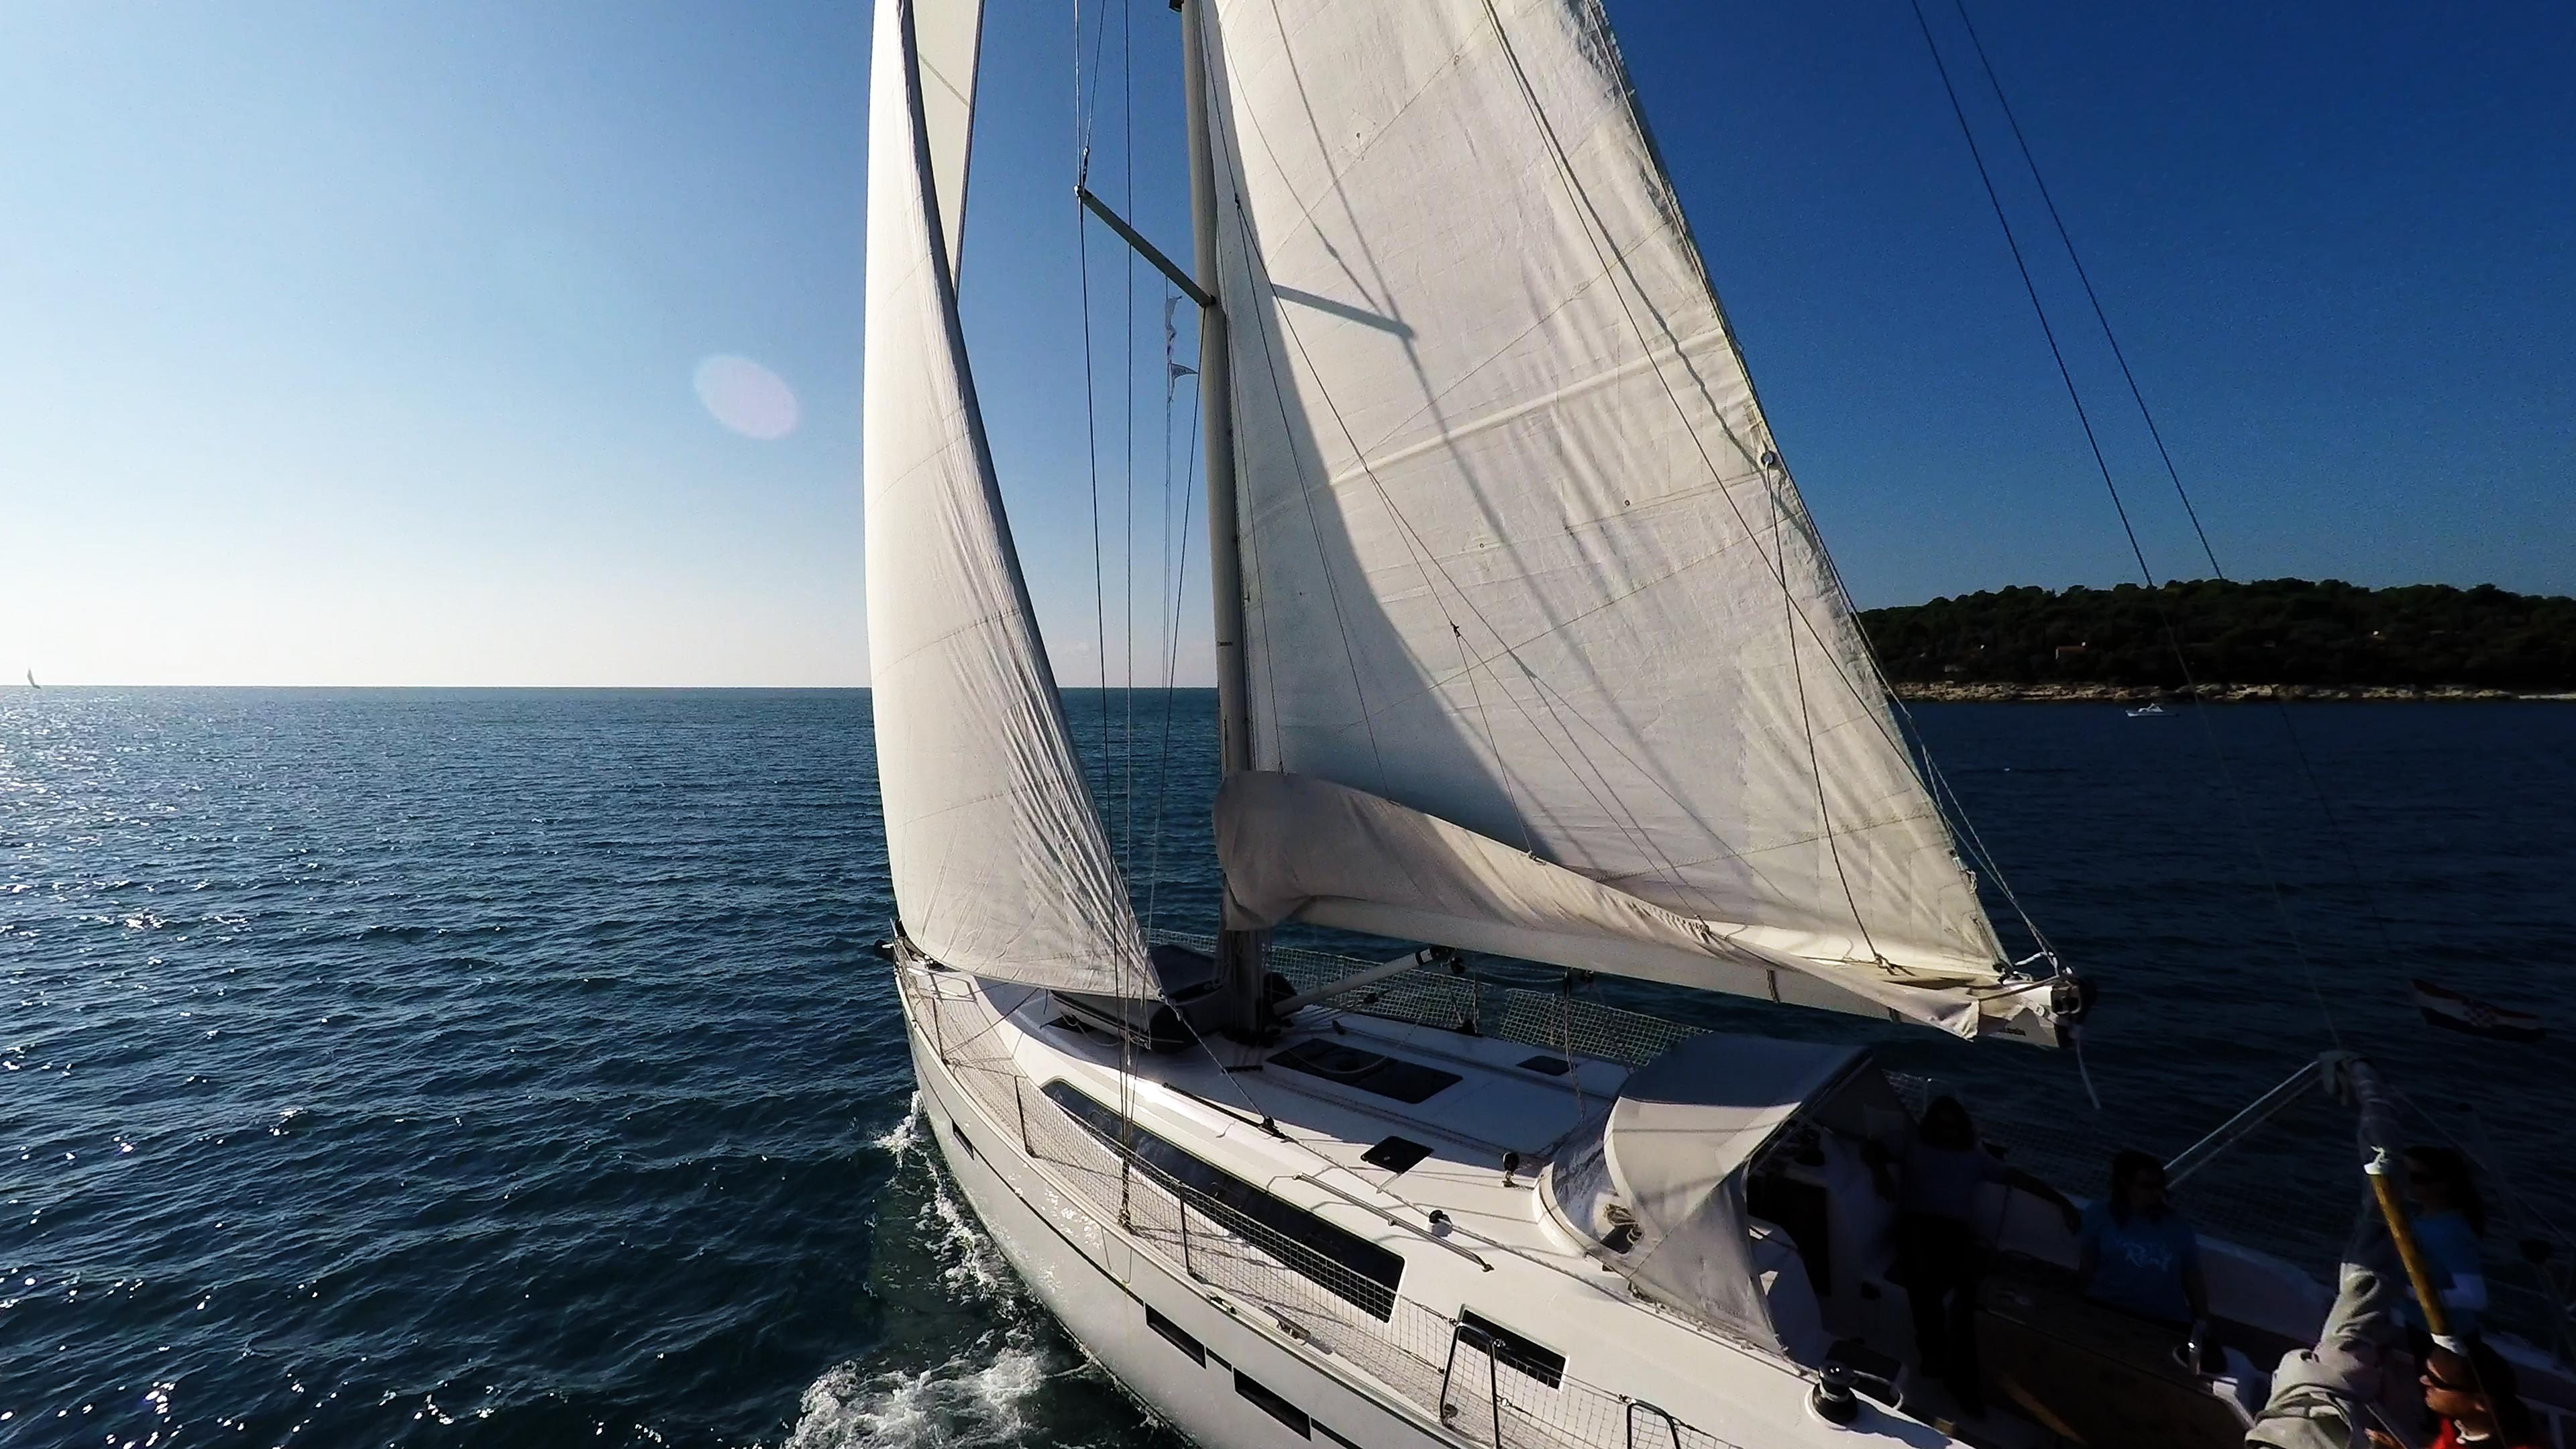 barcha a vela veleggiare al sole mare aperto barca a vela yacht bavaria 46